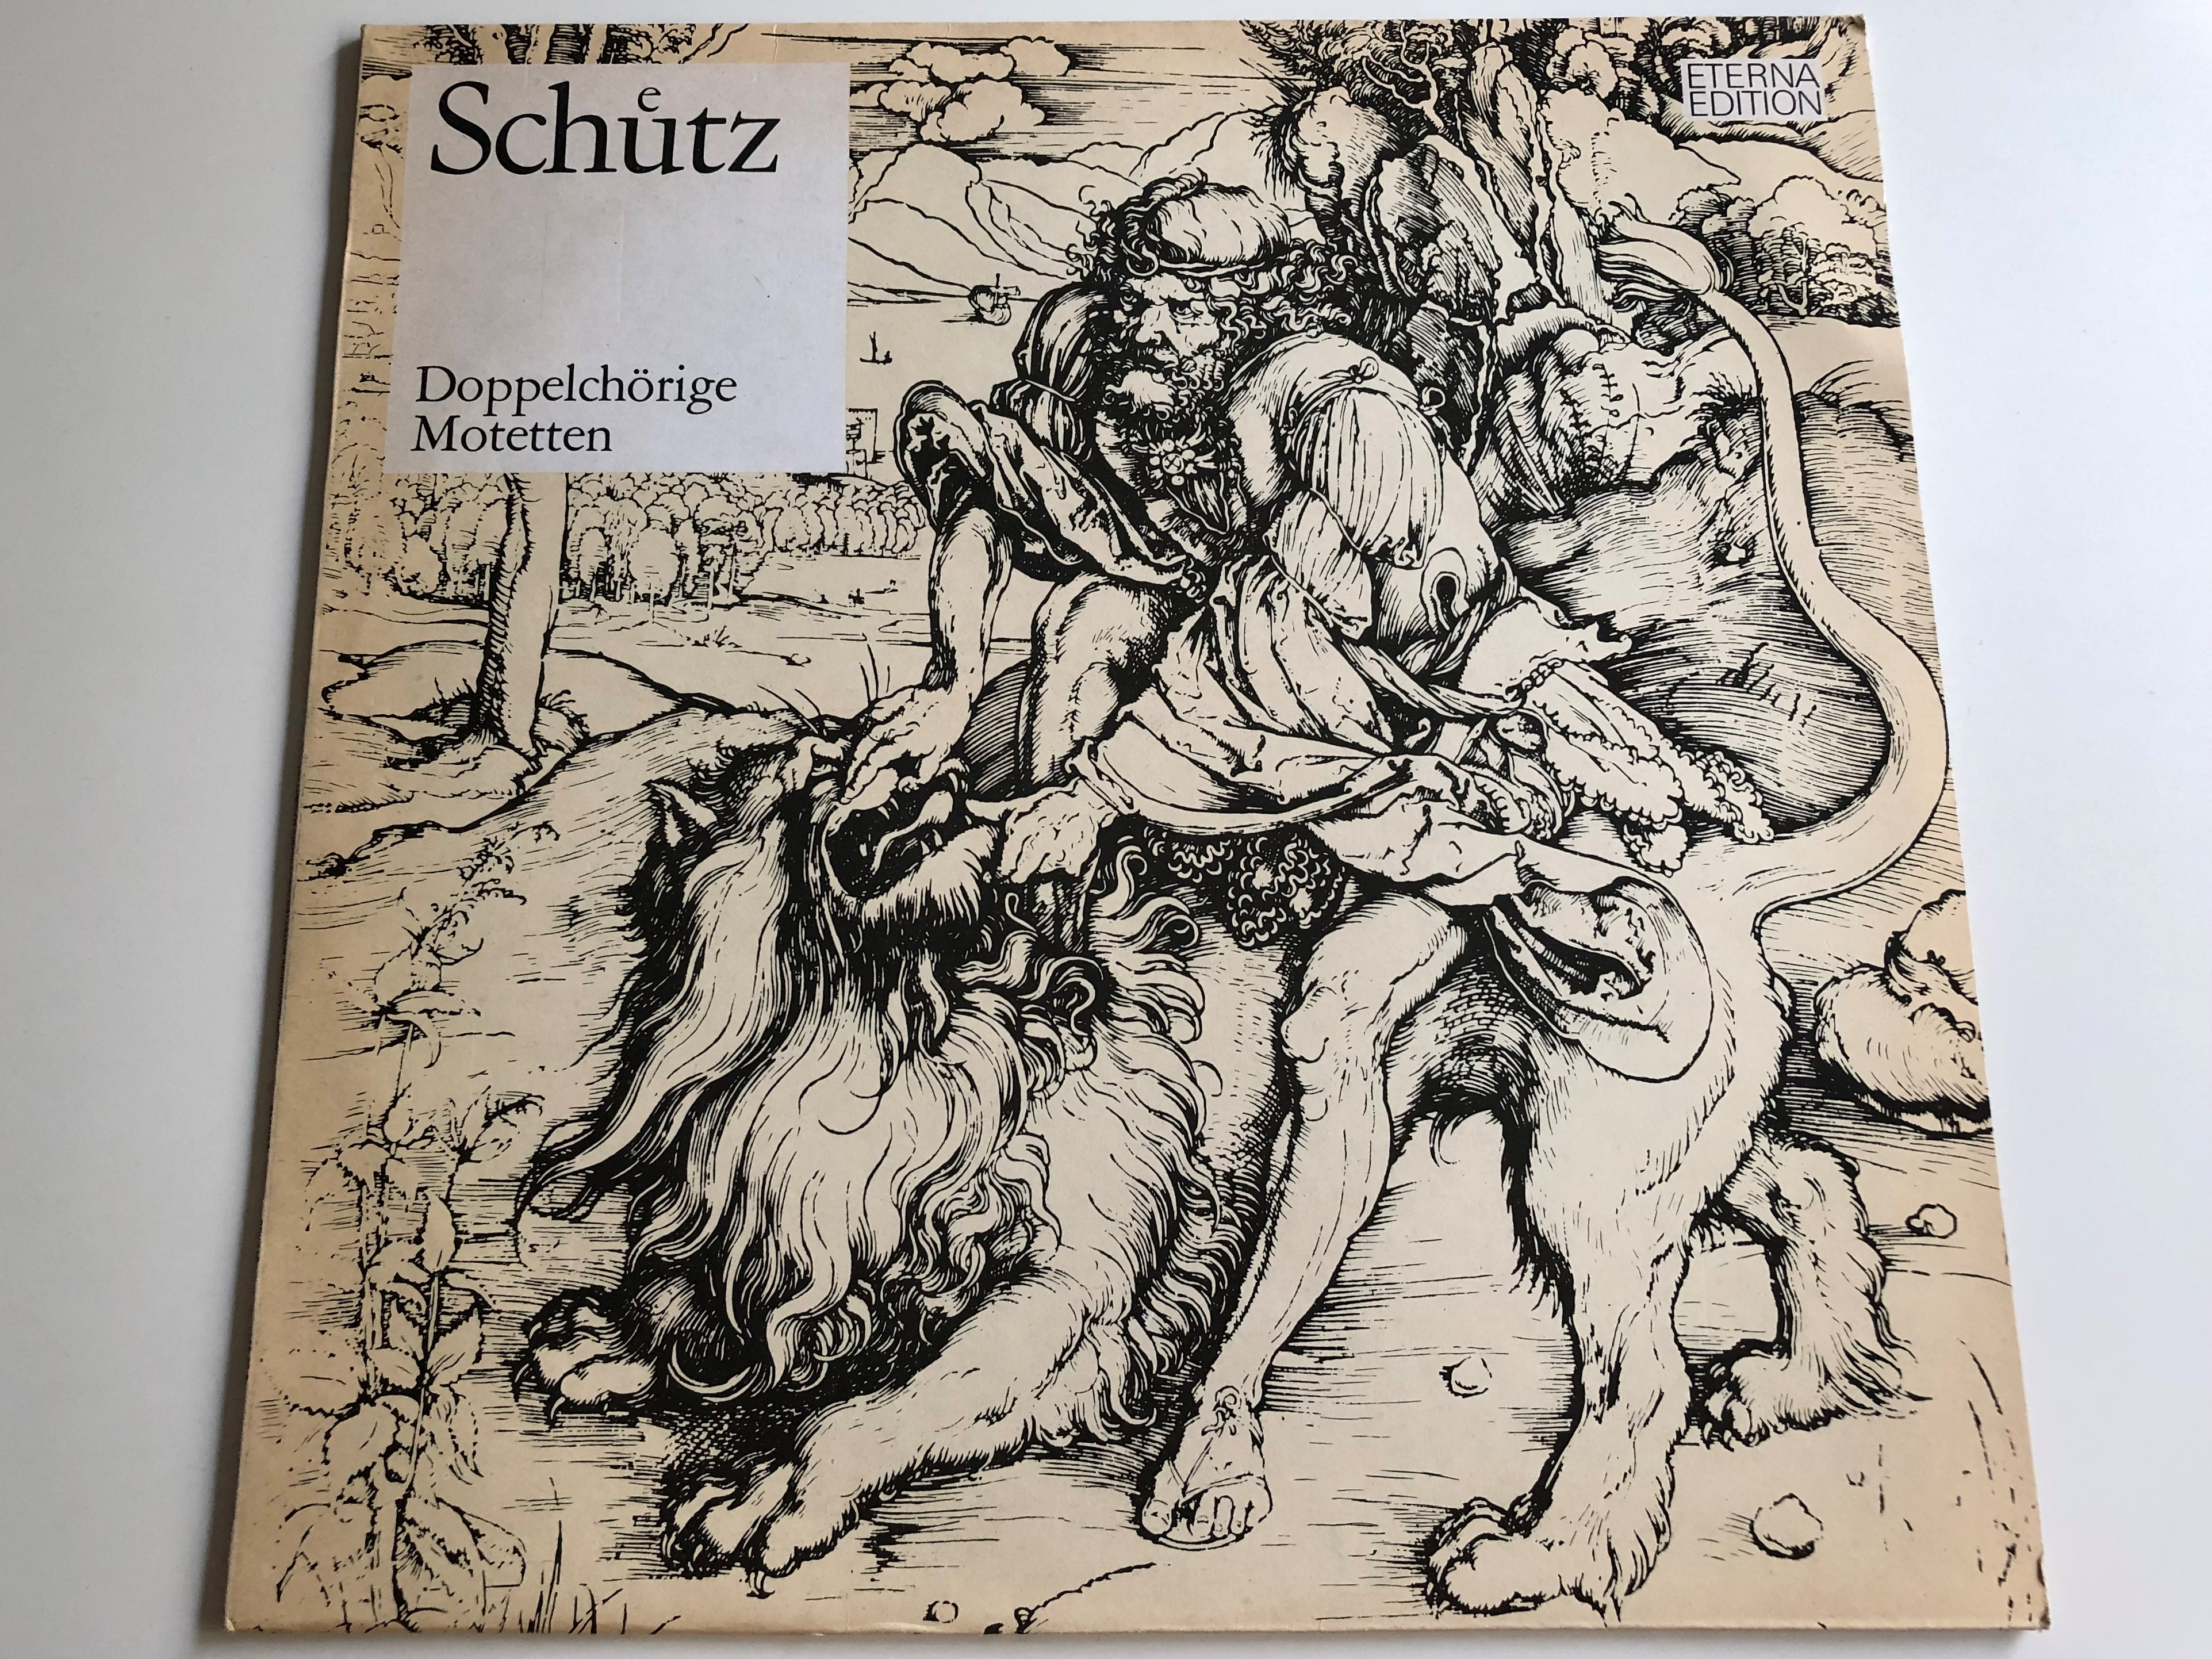 sch-tz-doppelch-rige-motetten-eterna-edition-lp-stereo-8-25-691-1-.jpg